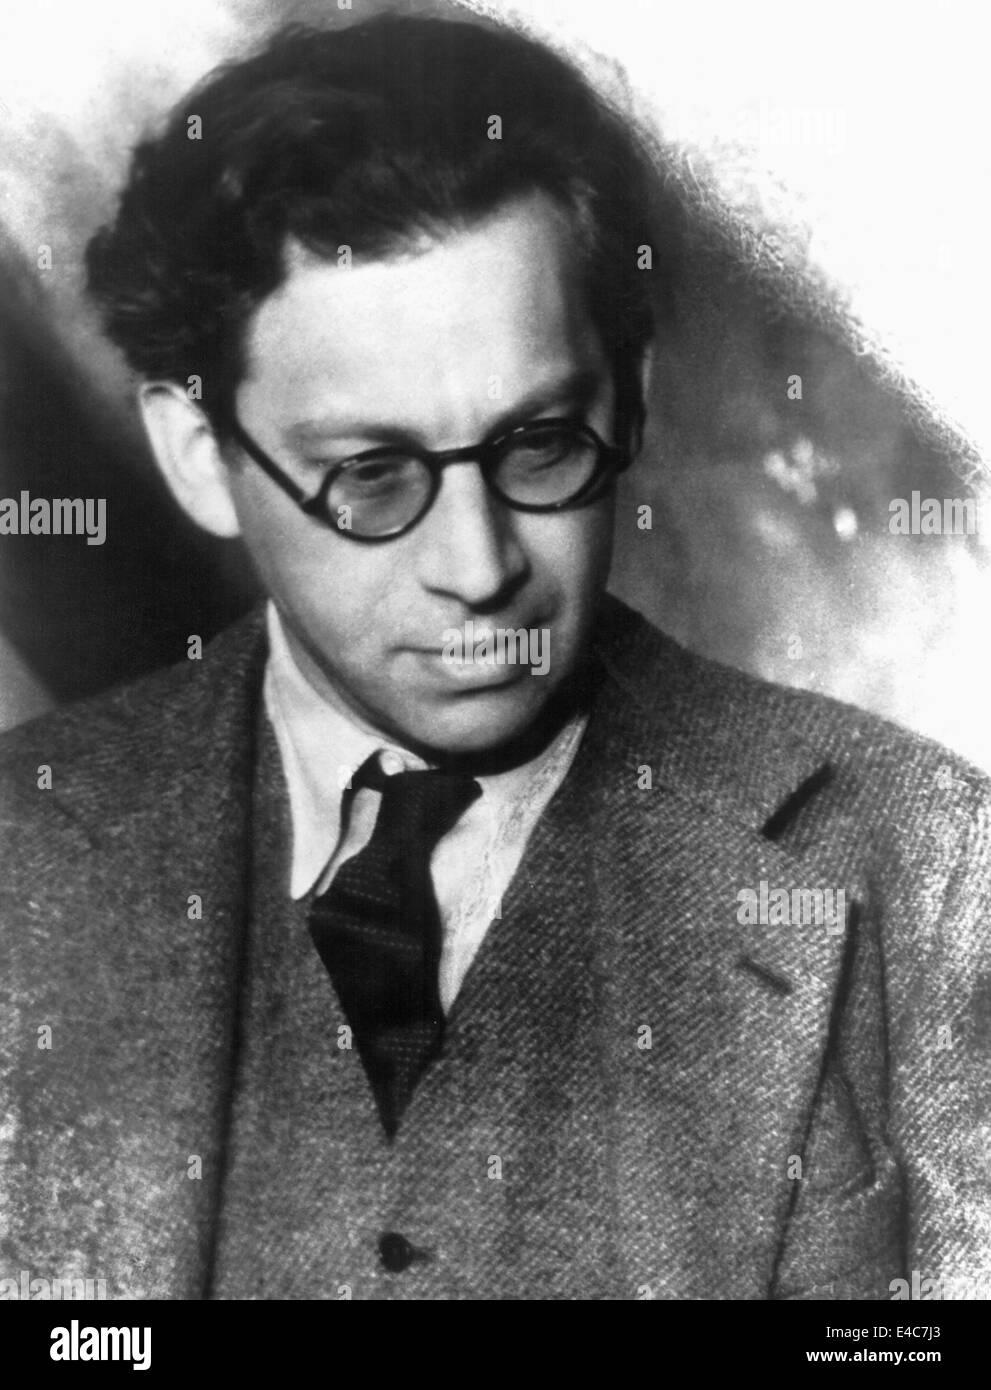 Alexander Korda, Hungarian-born British Film Producer and Director, Portrait, circa 1920's - Stock Image